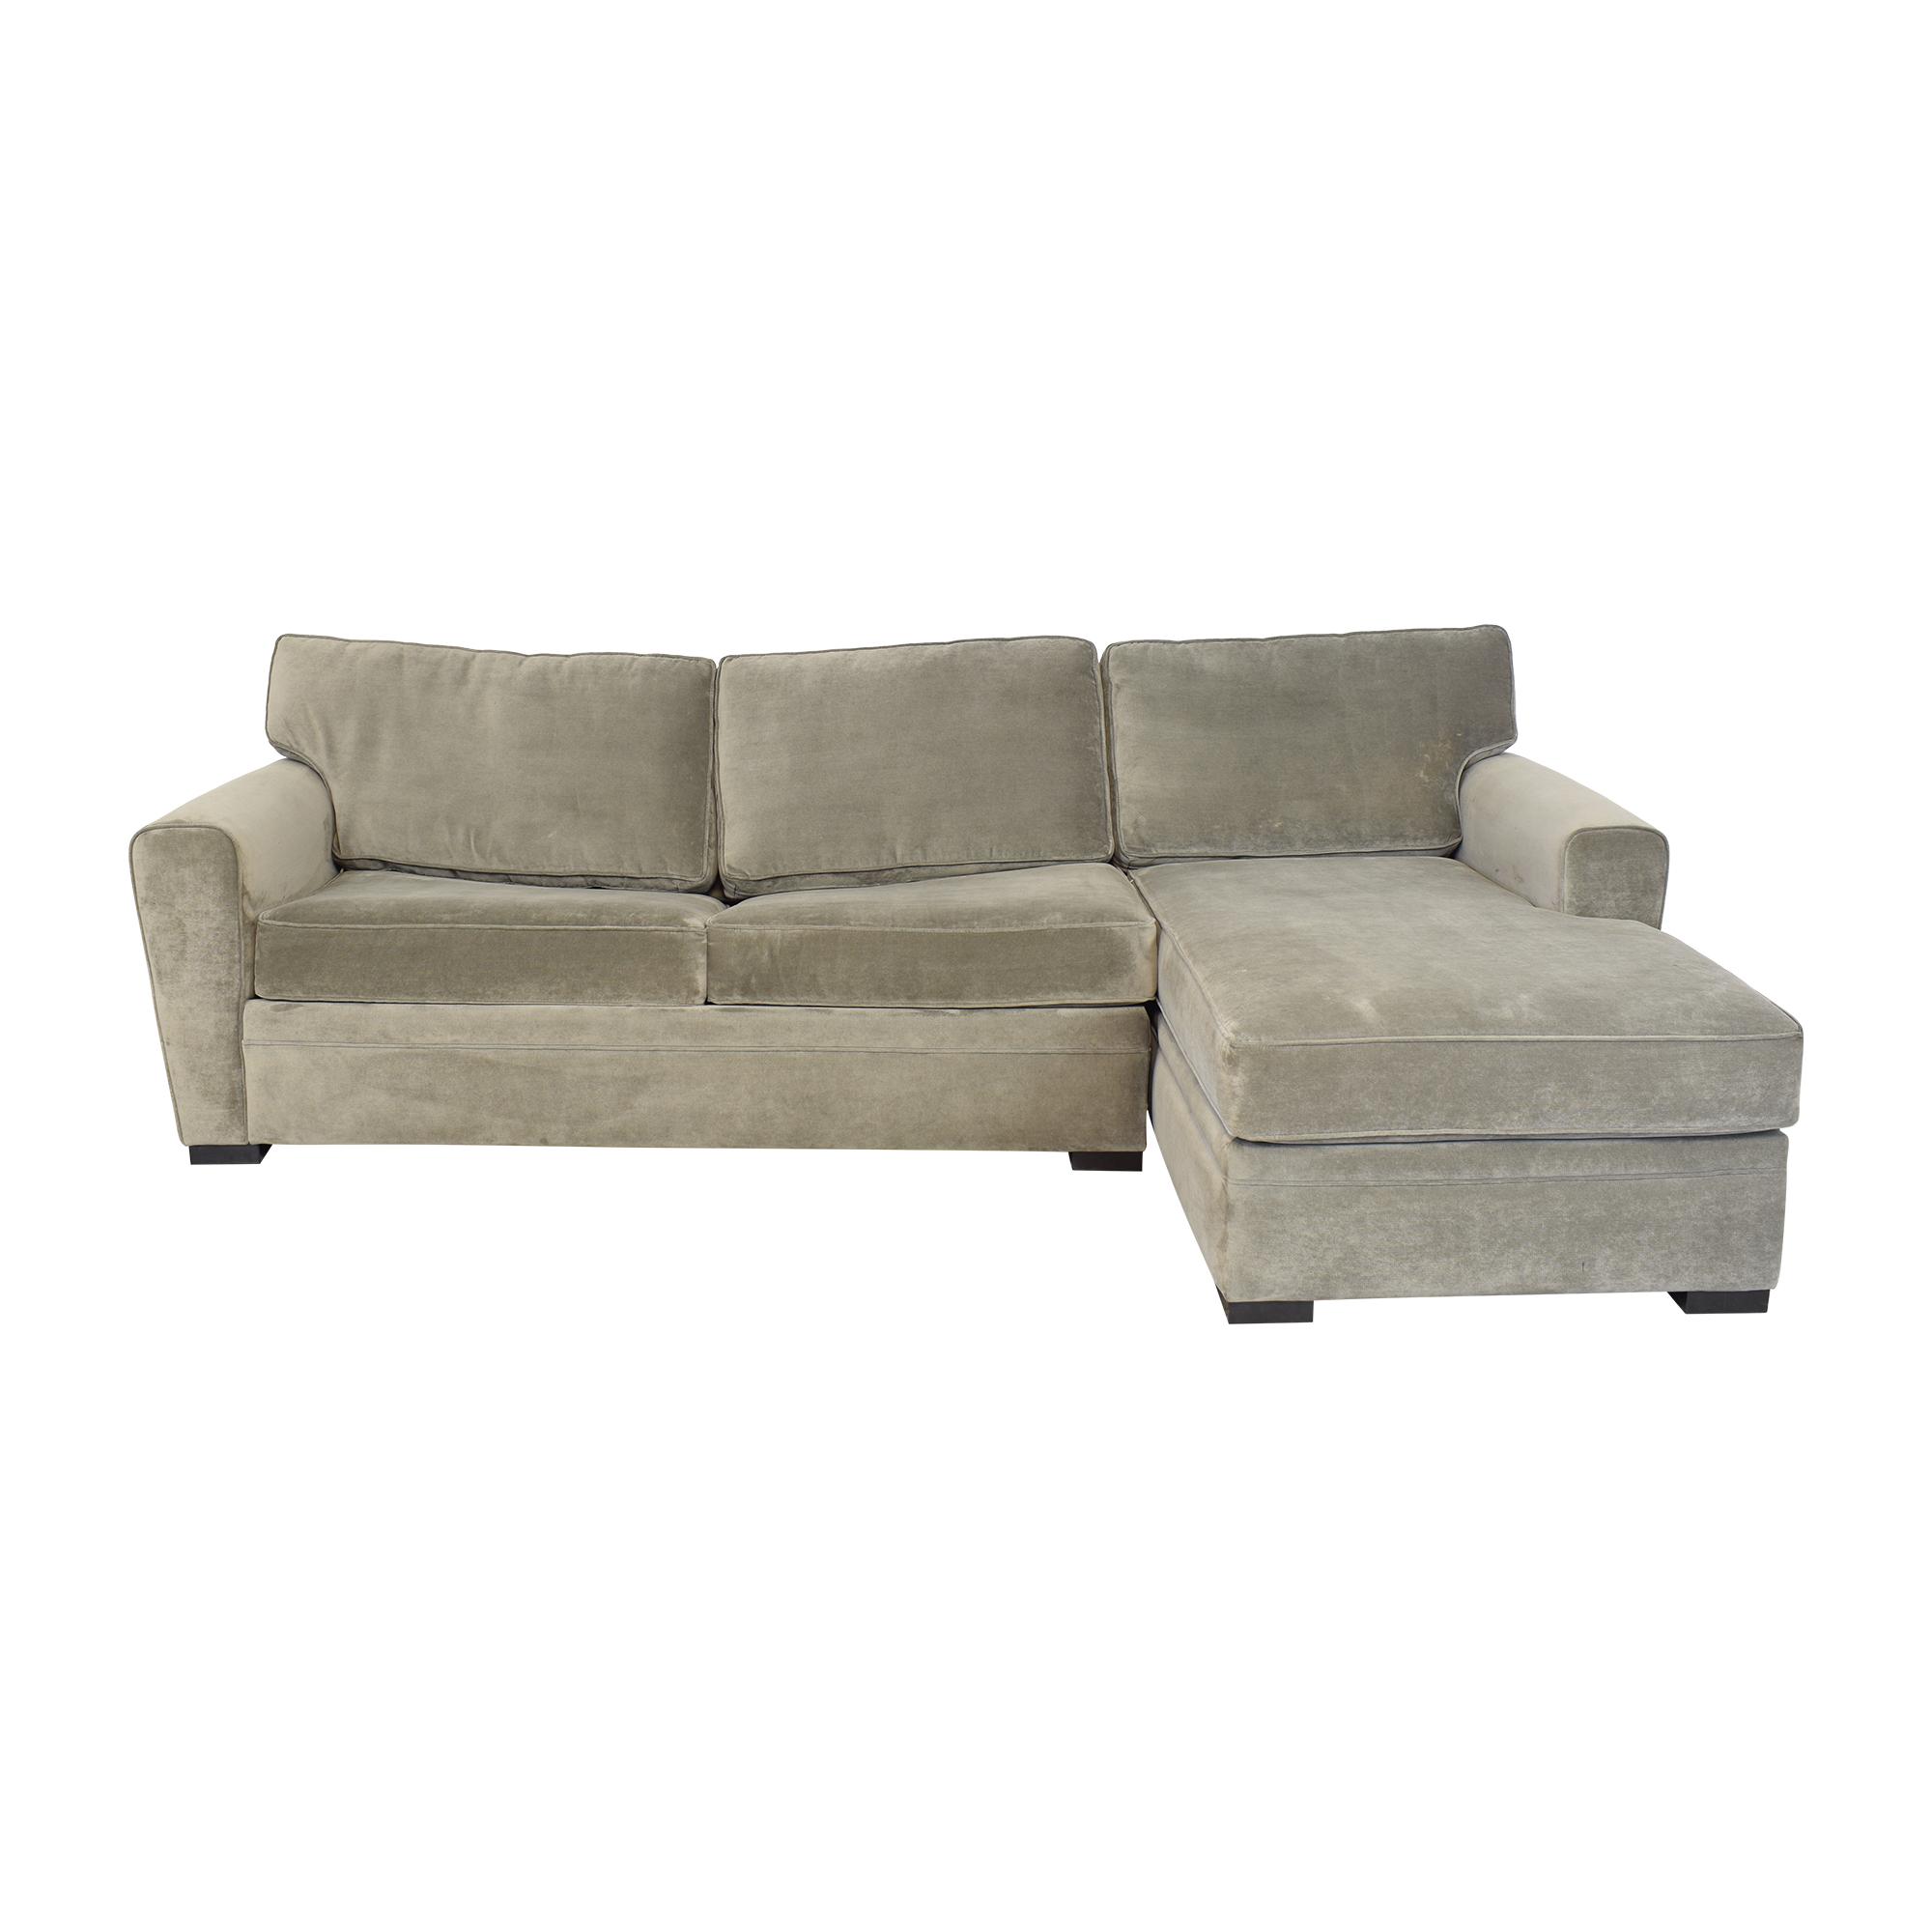 Raymour & Flanigan Raymour & Flanigan Artemis II Sectional Sofa with Sleeper Sectionals